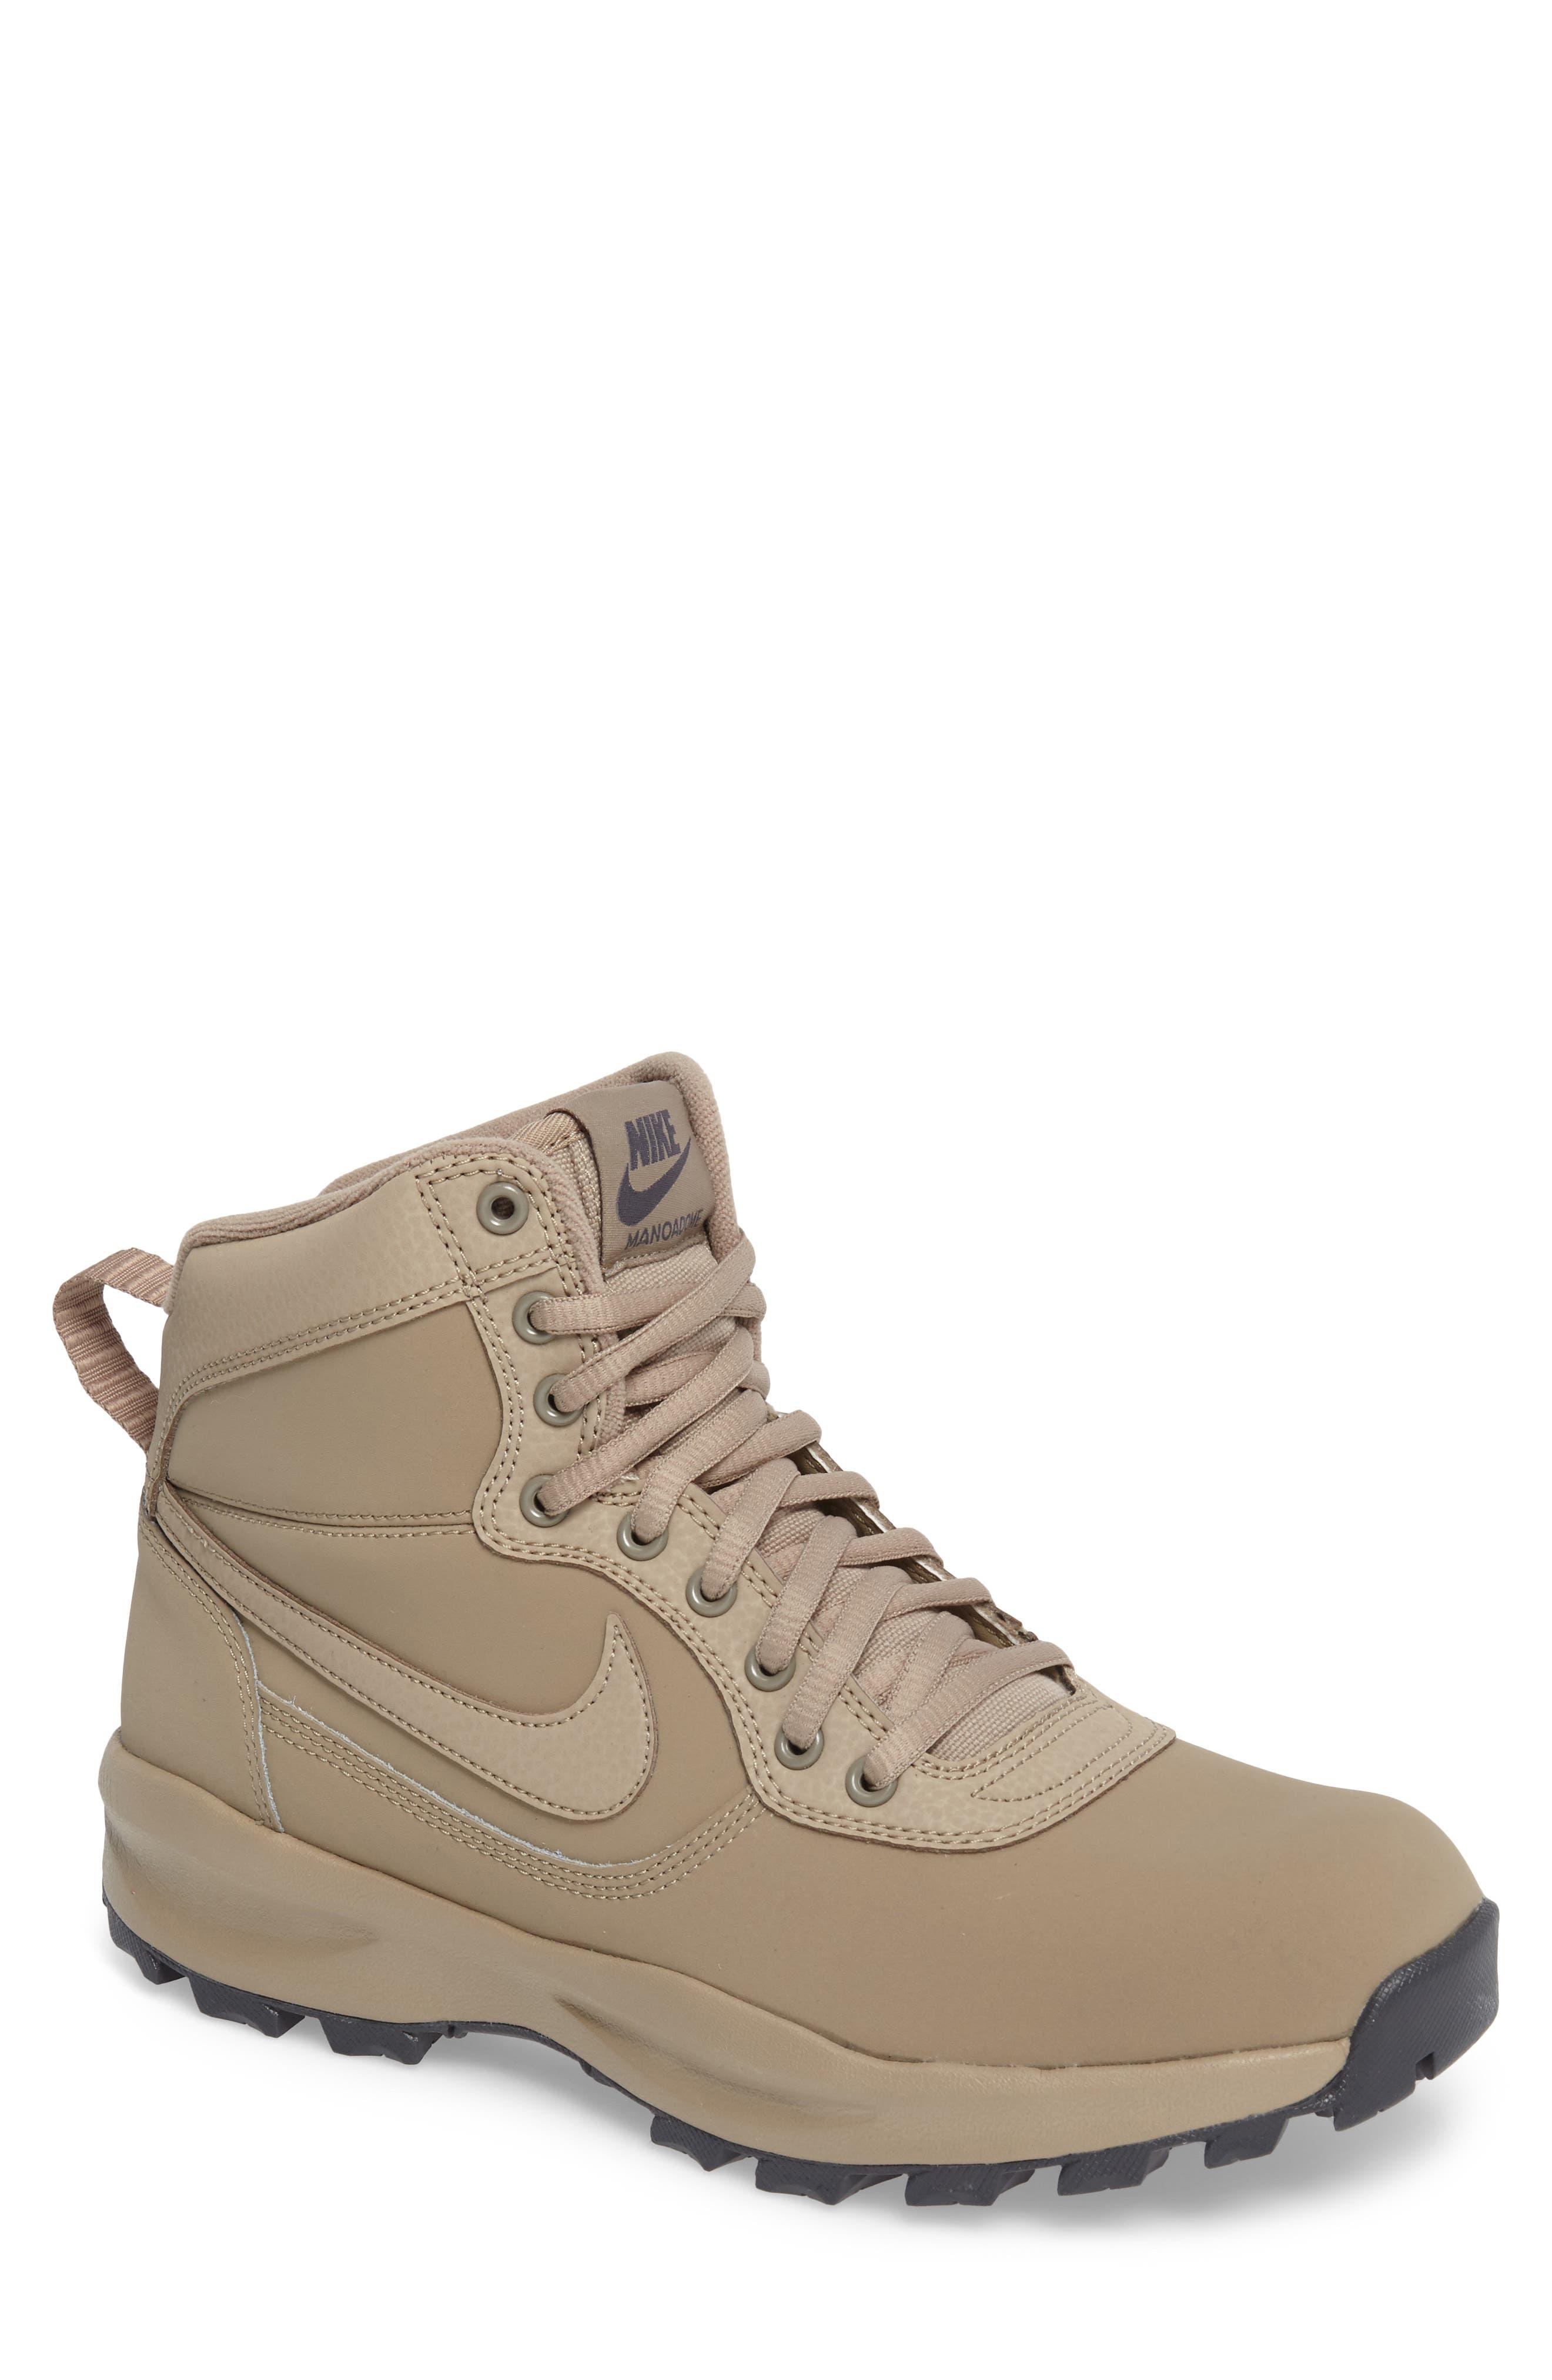 Nike Manoadome Boot (Men)